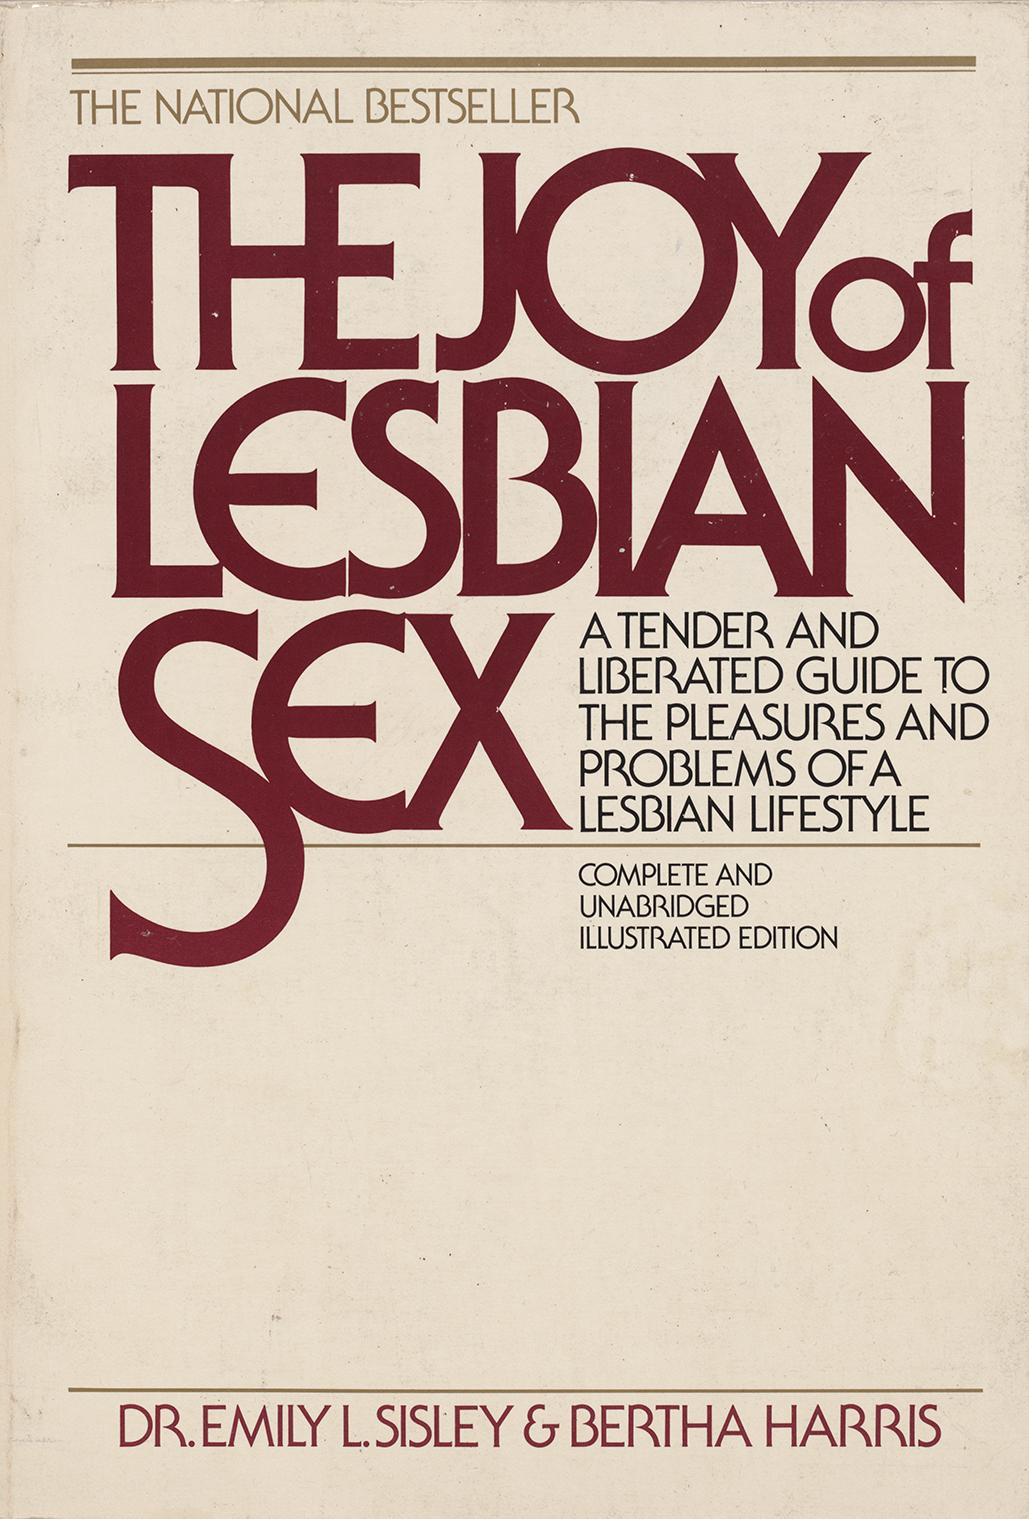 joy of lesbian sex